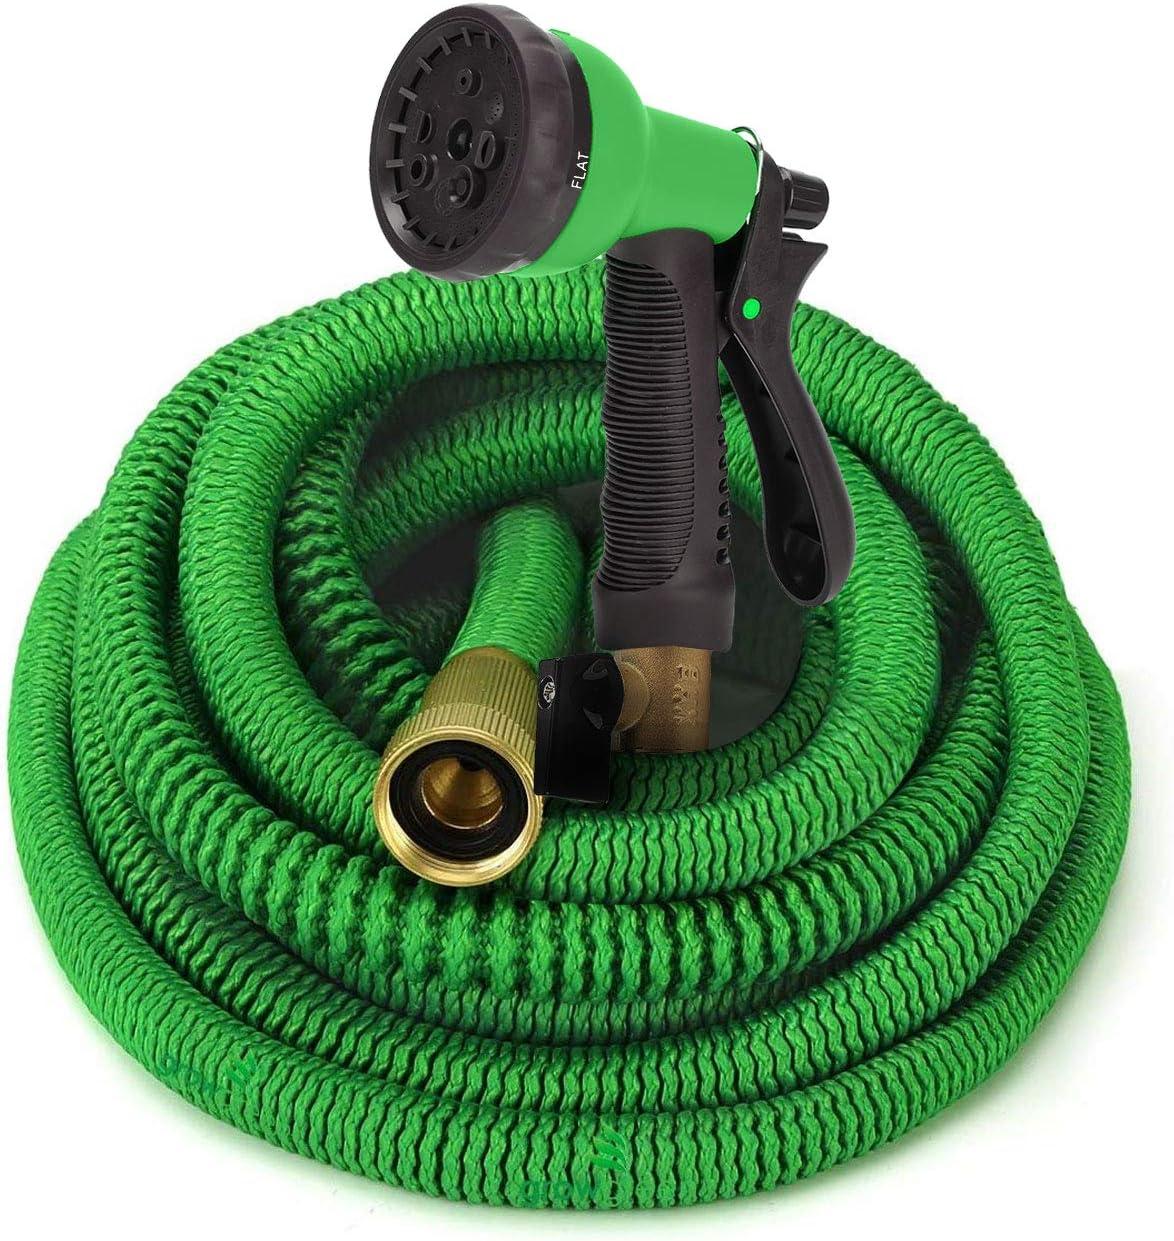 Best for carpeting gardens: GrowGreen Garden Hose